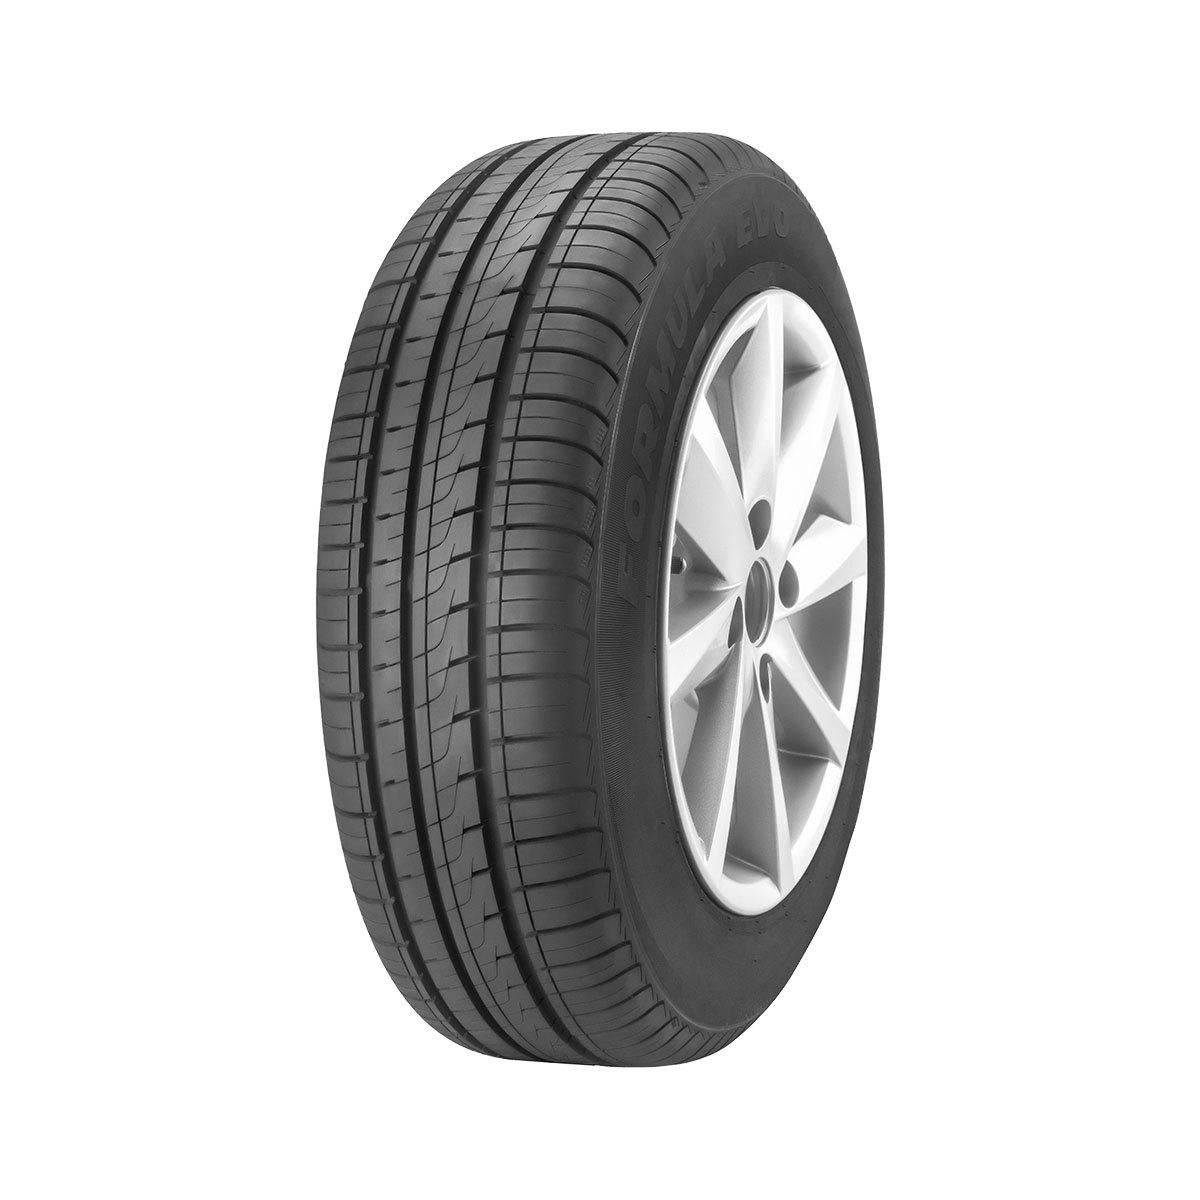 Pneu Pirelli Formula Evo 175/70 R13 82T - Cantele Centro Automotivo